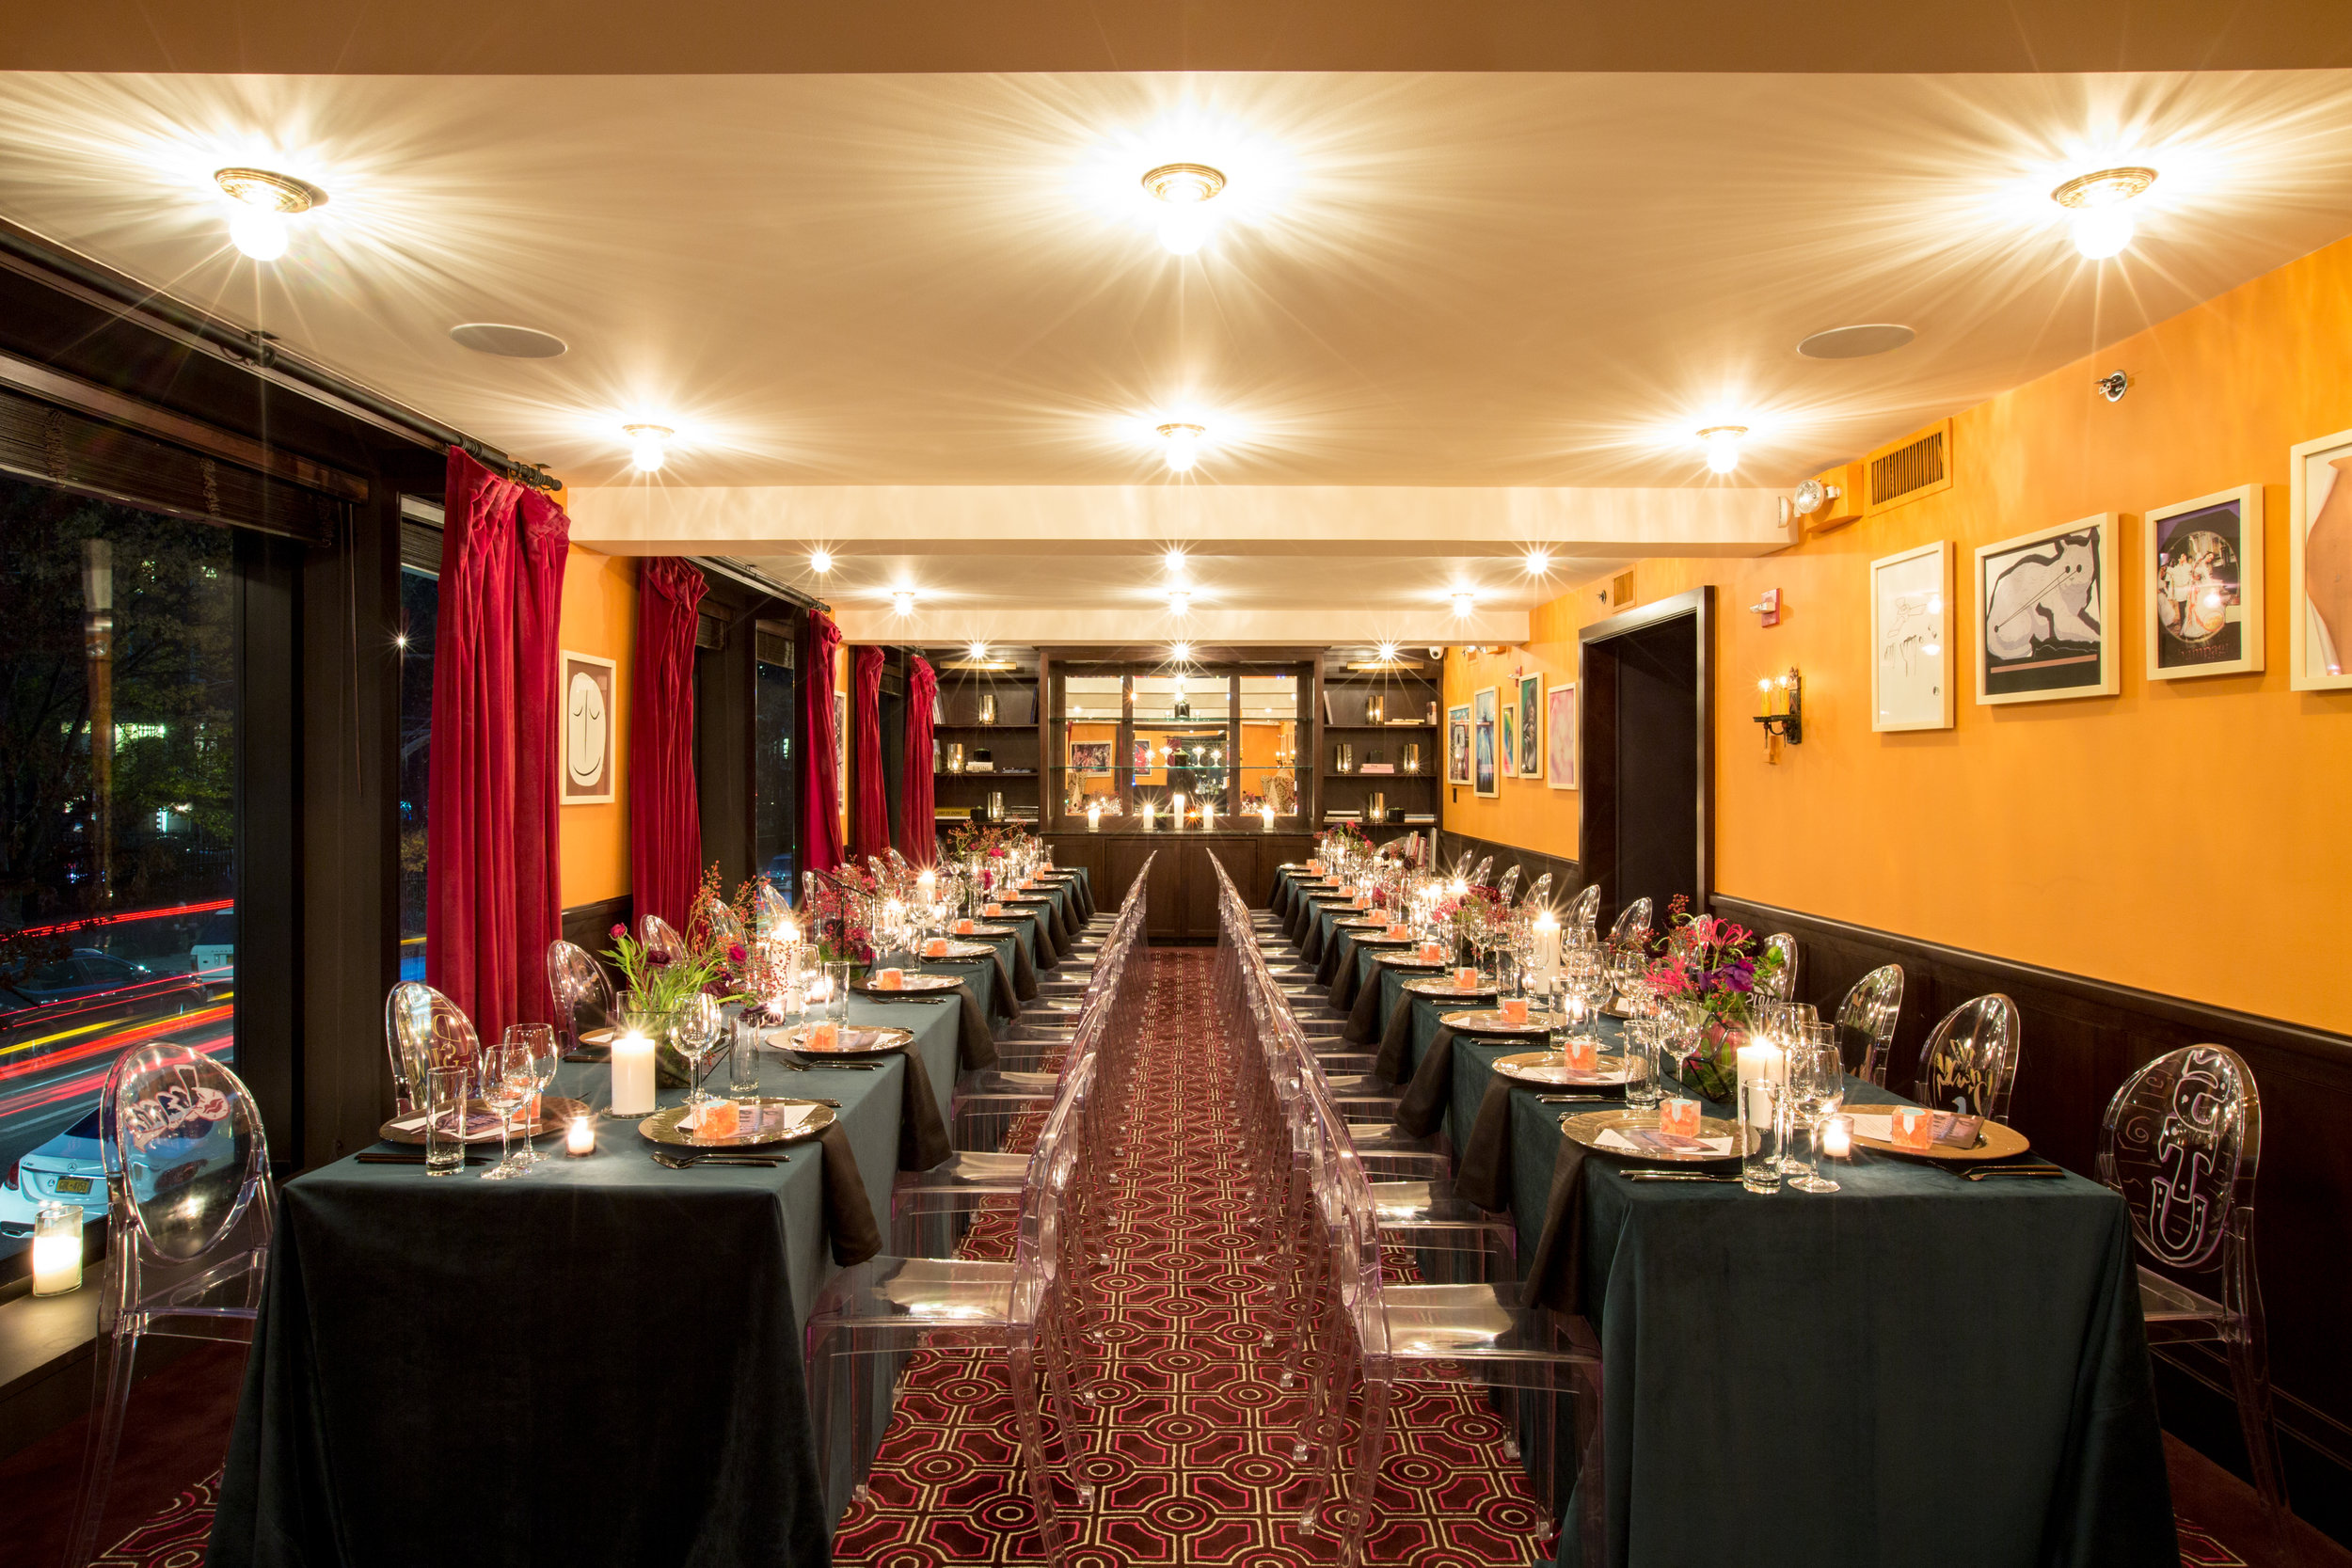 Gramercy-Park-Hotel-Holiday-Party-Andrea-Freeman-Events-1.JPG